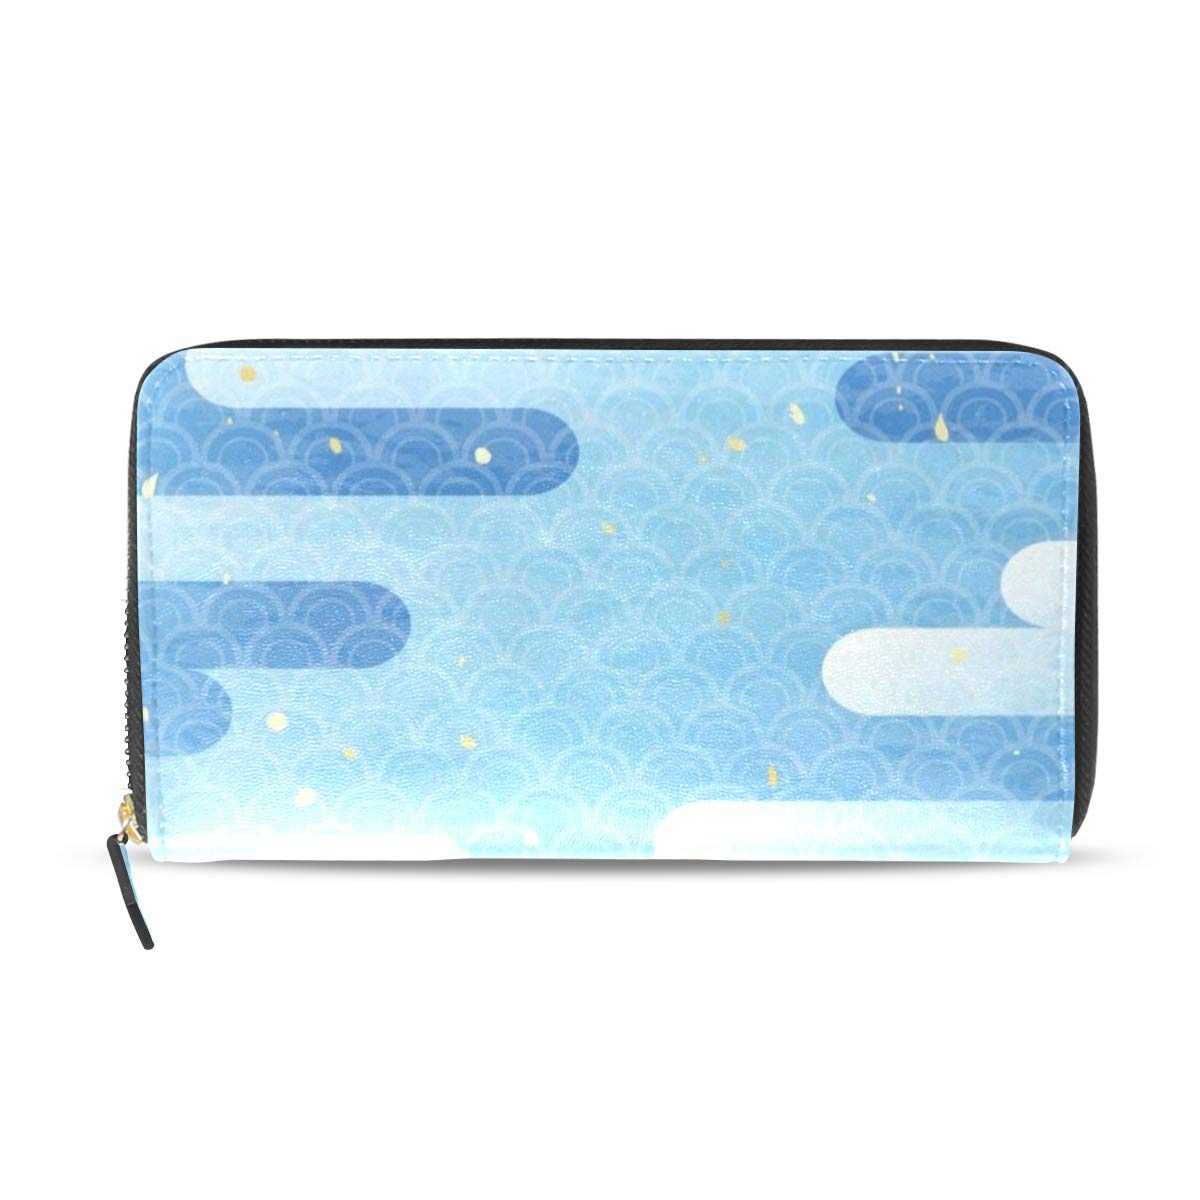 Womens Wallets Stylish Christmas Snowflake Leather Passport Wallet Coin Purse Girls Handbags